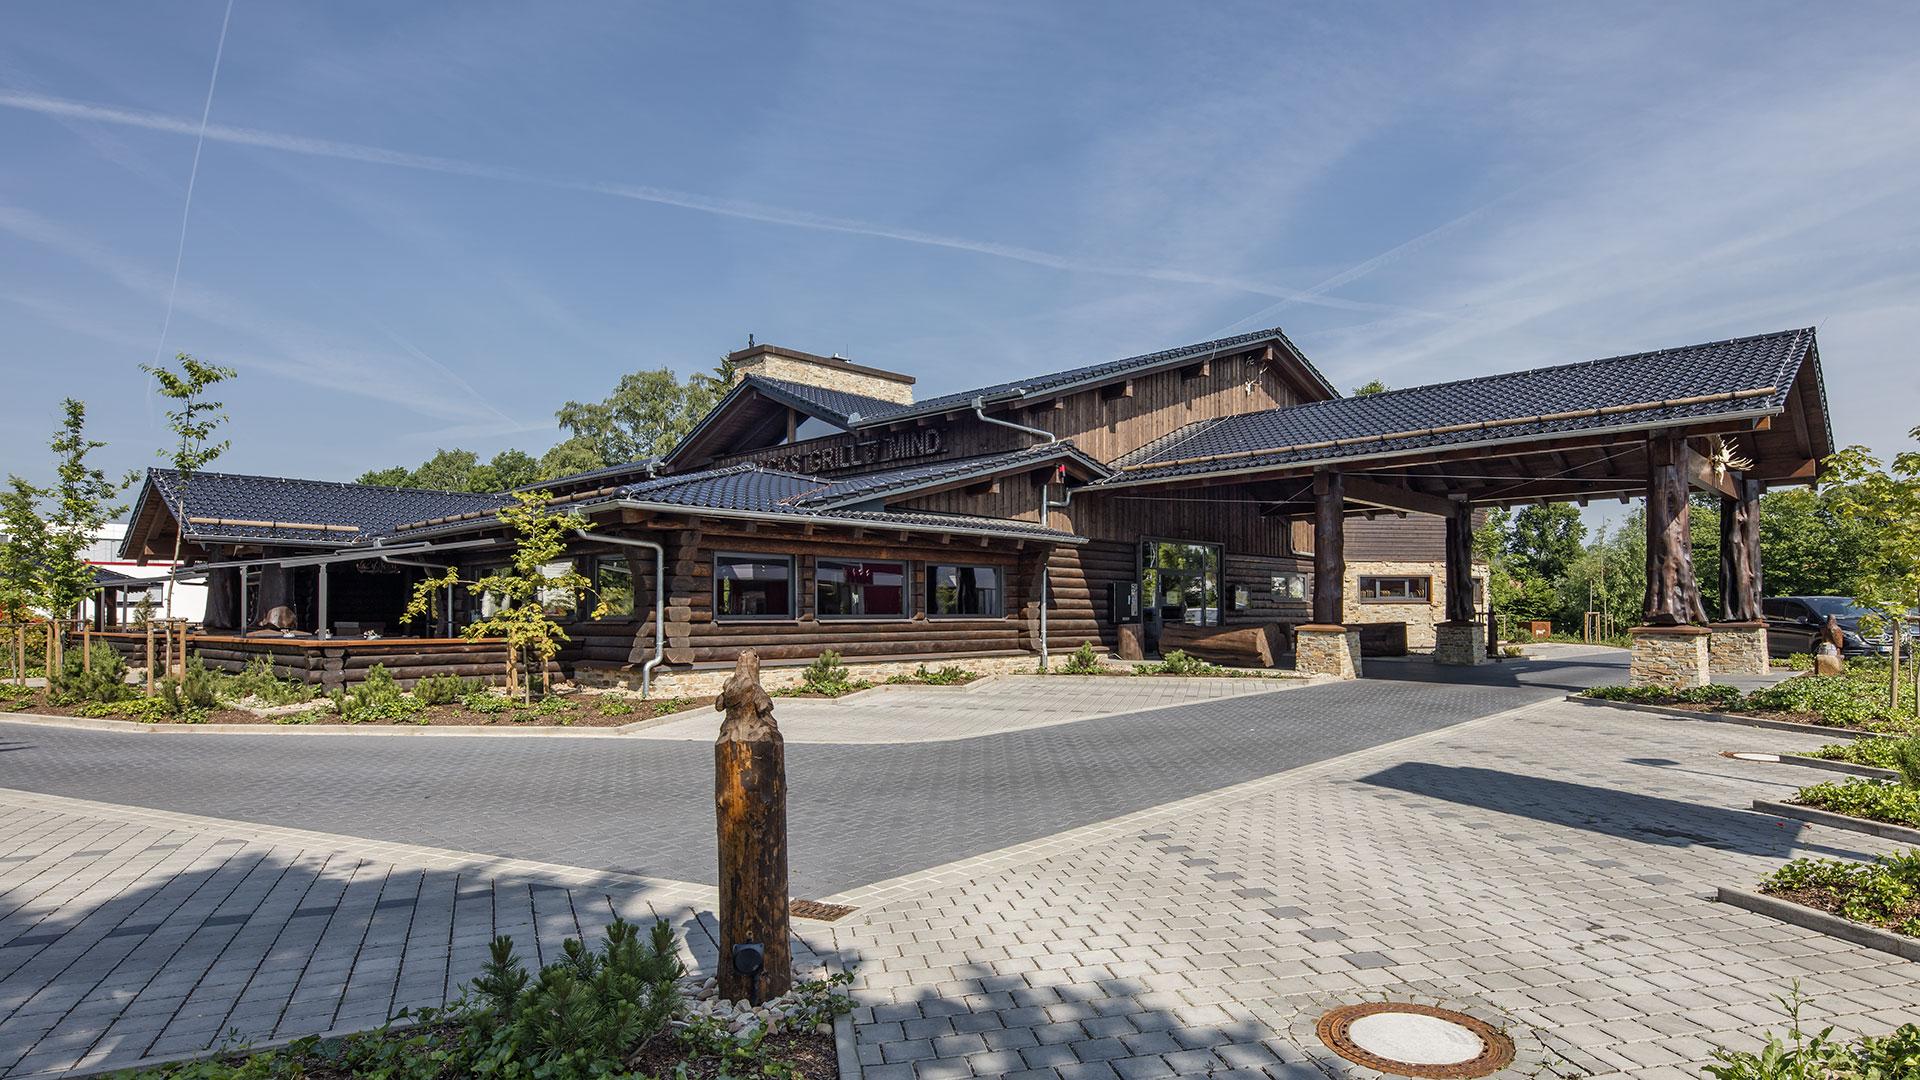 Architekturfotografie: Dachgeometrie | Foto: Dieter Eikenberg, imprints